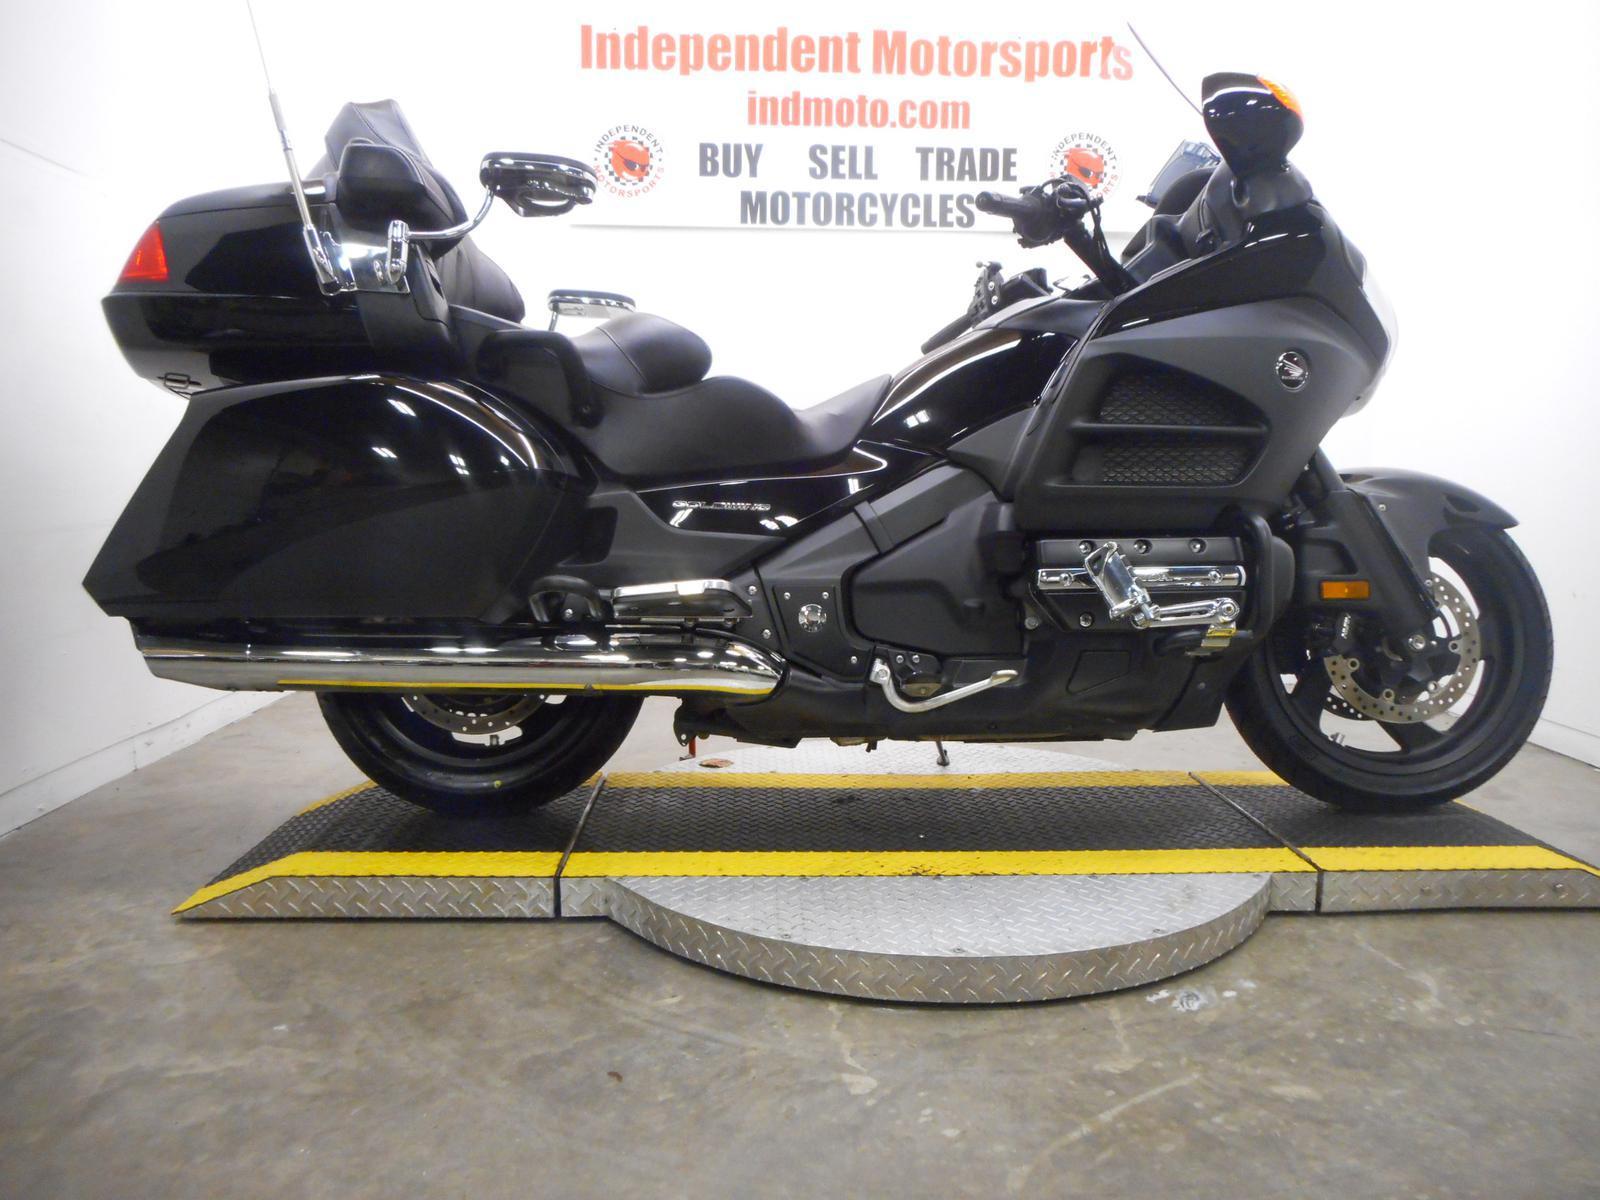 Cycle Search International En Motorcycles